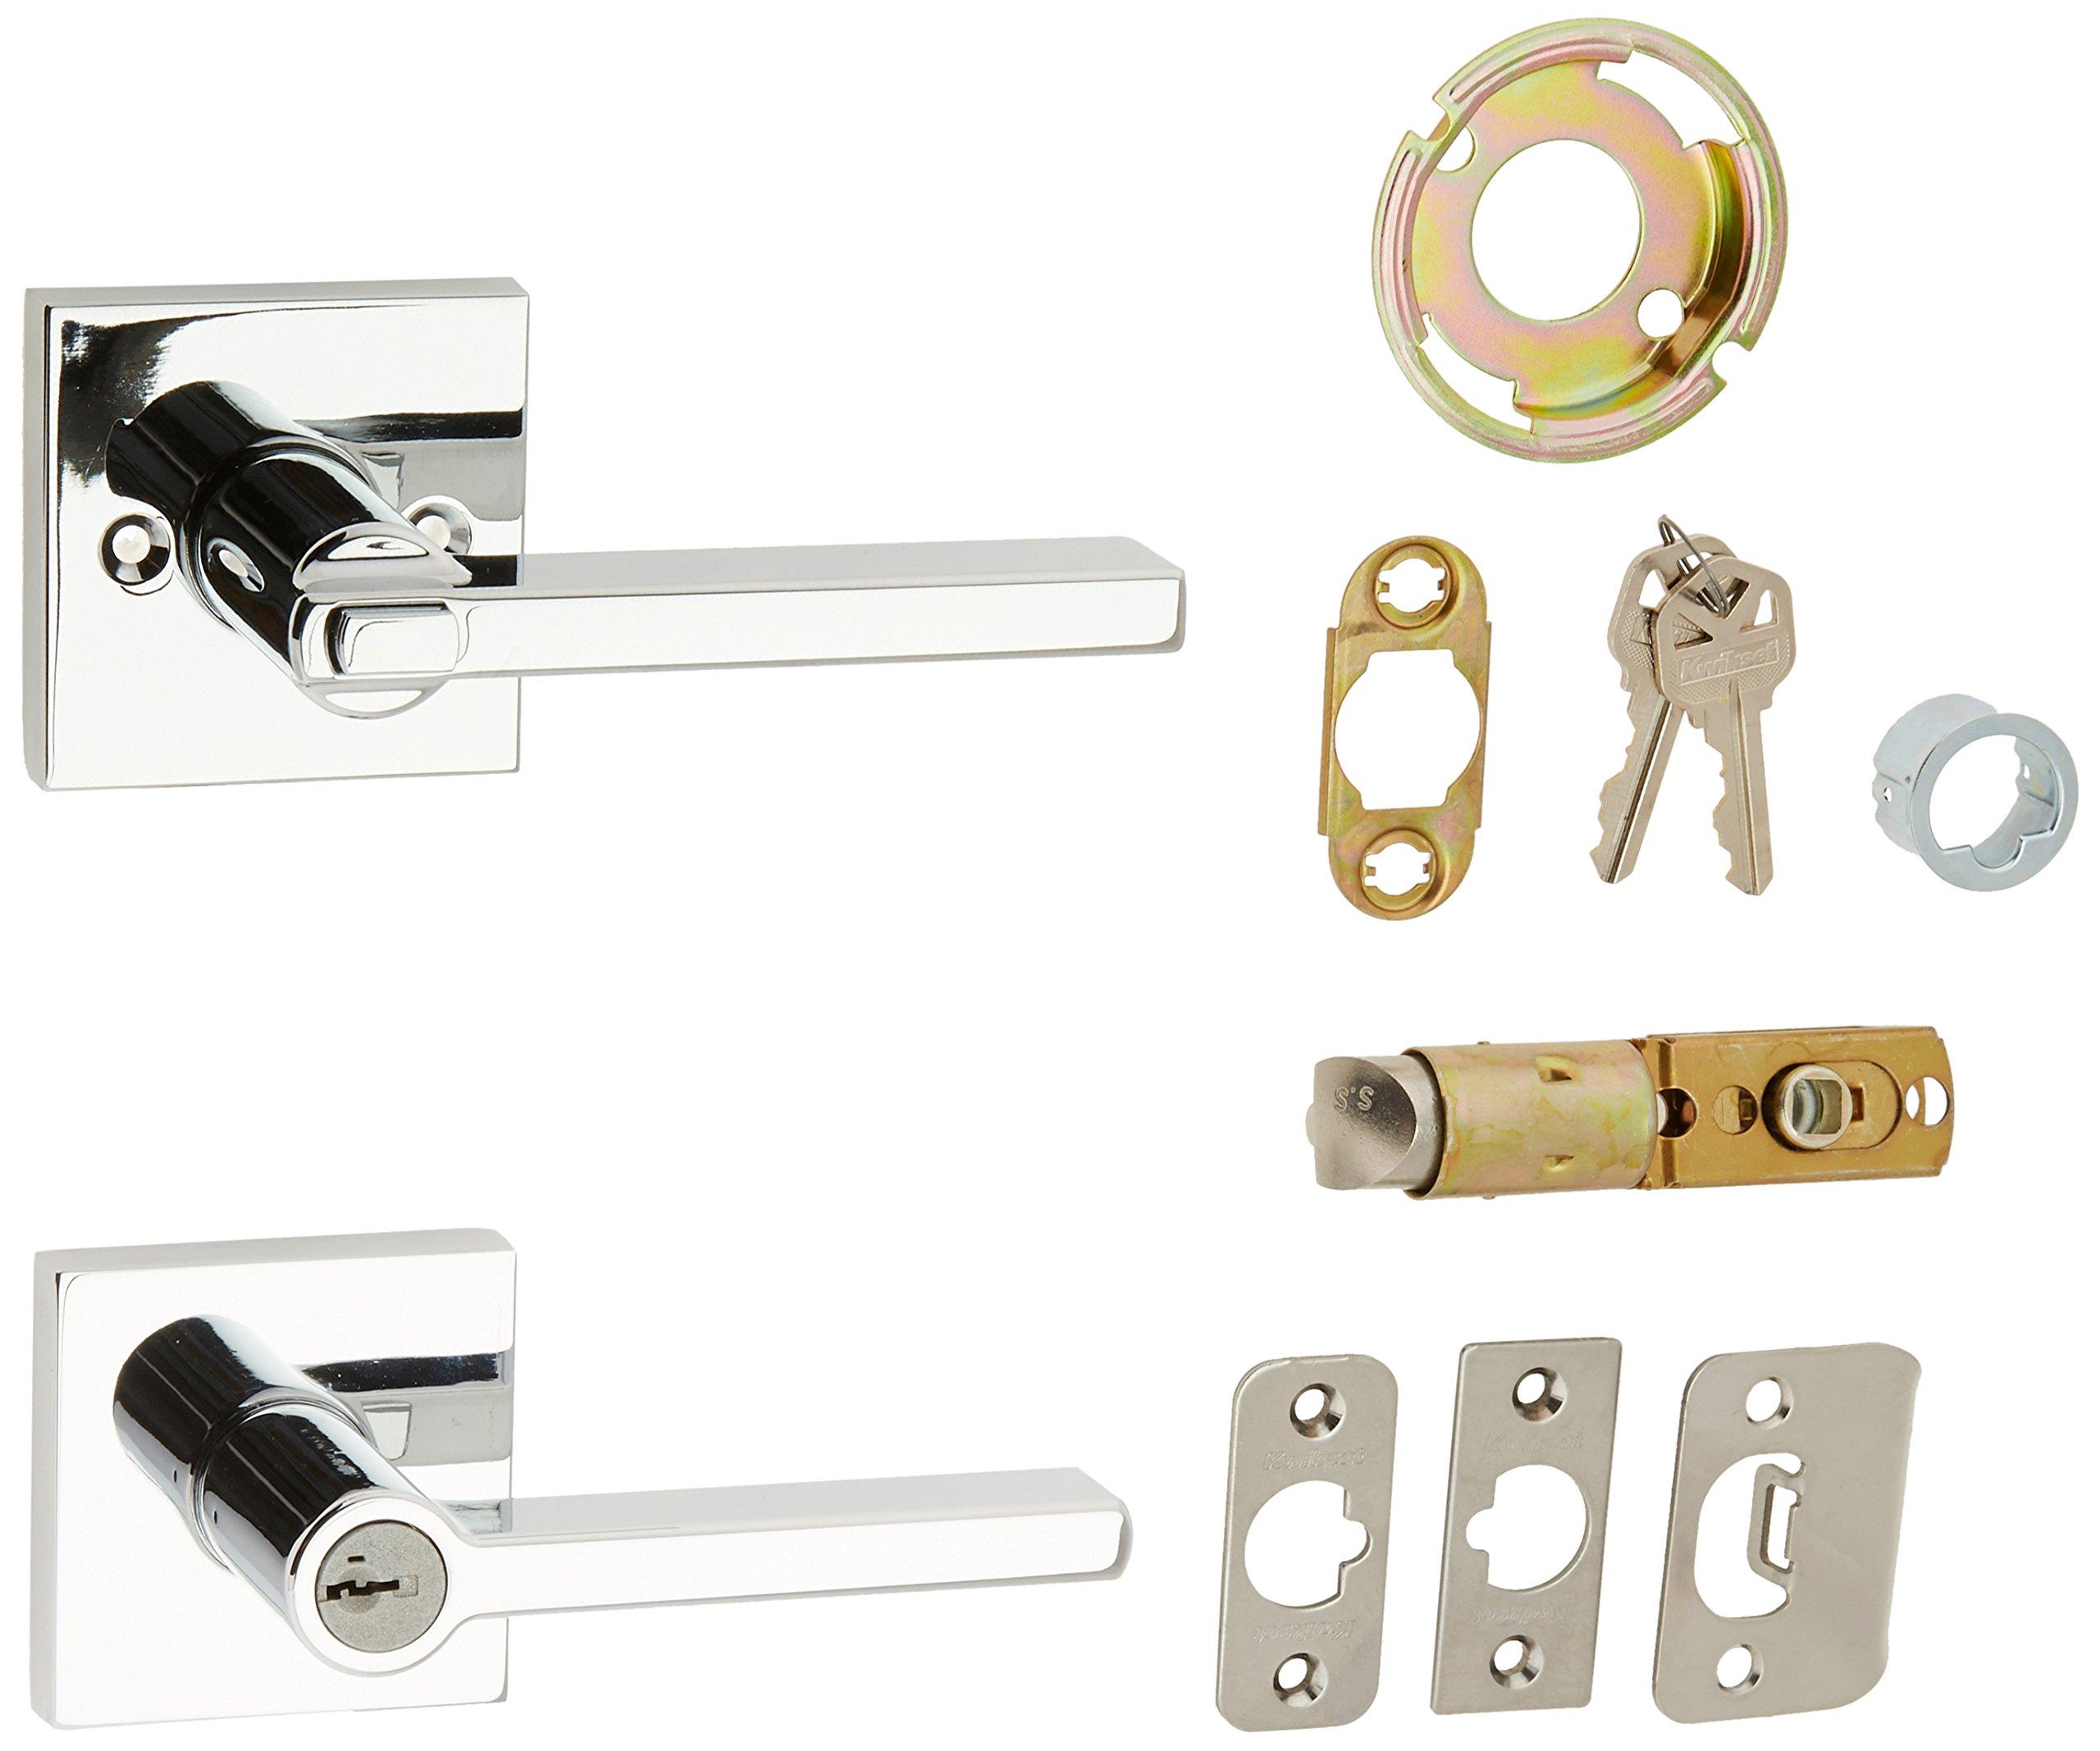 Kwikset 156HFLSQT-26S Halifax Square Entry Door Lock Smart Key Bright Chrome Finish